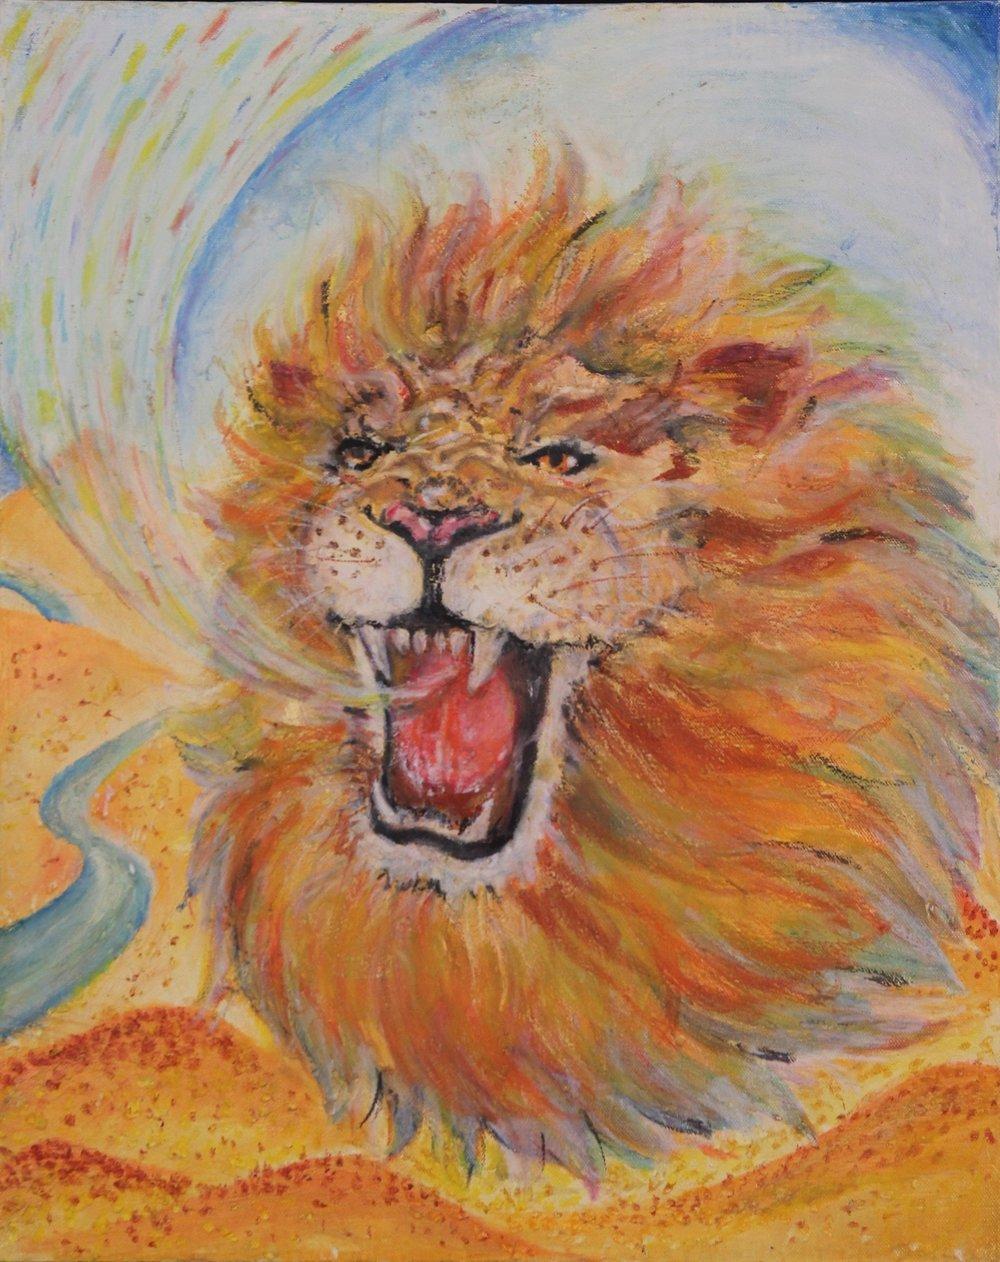 The Lion of David